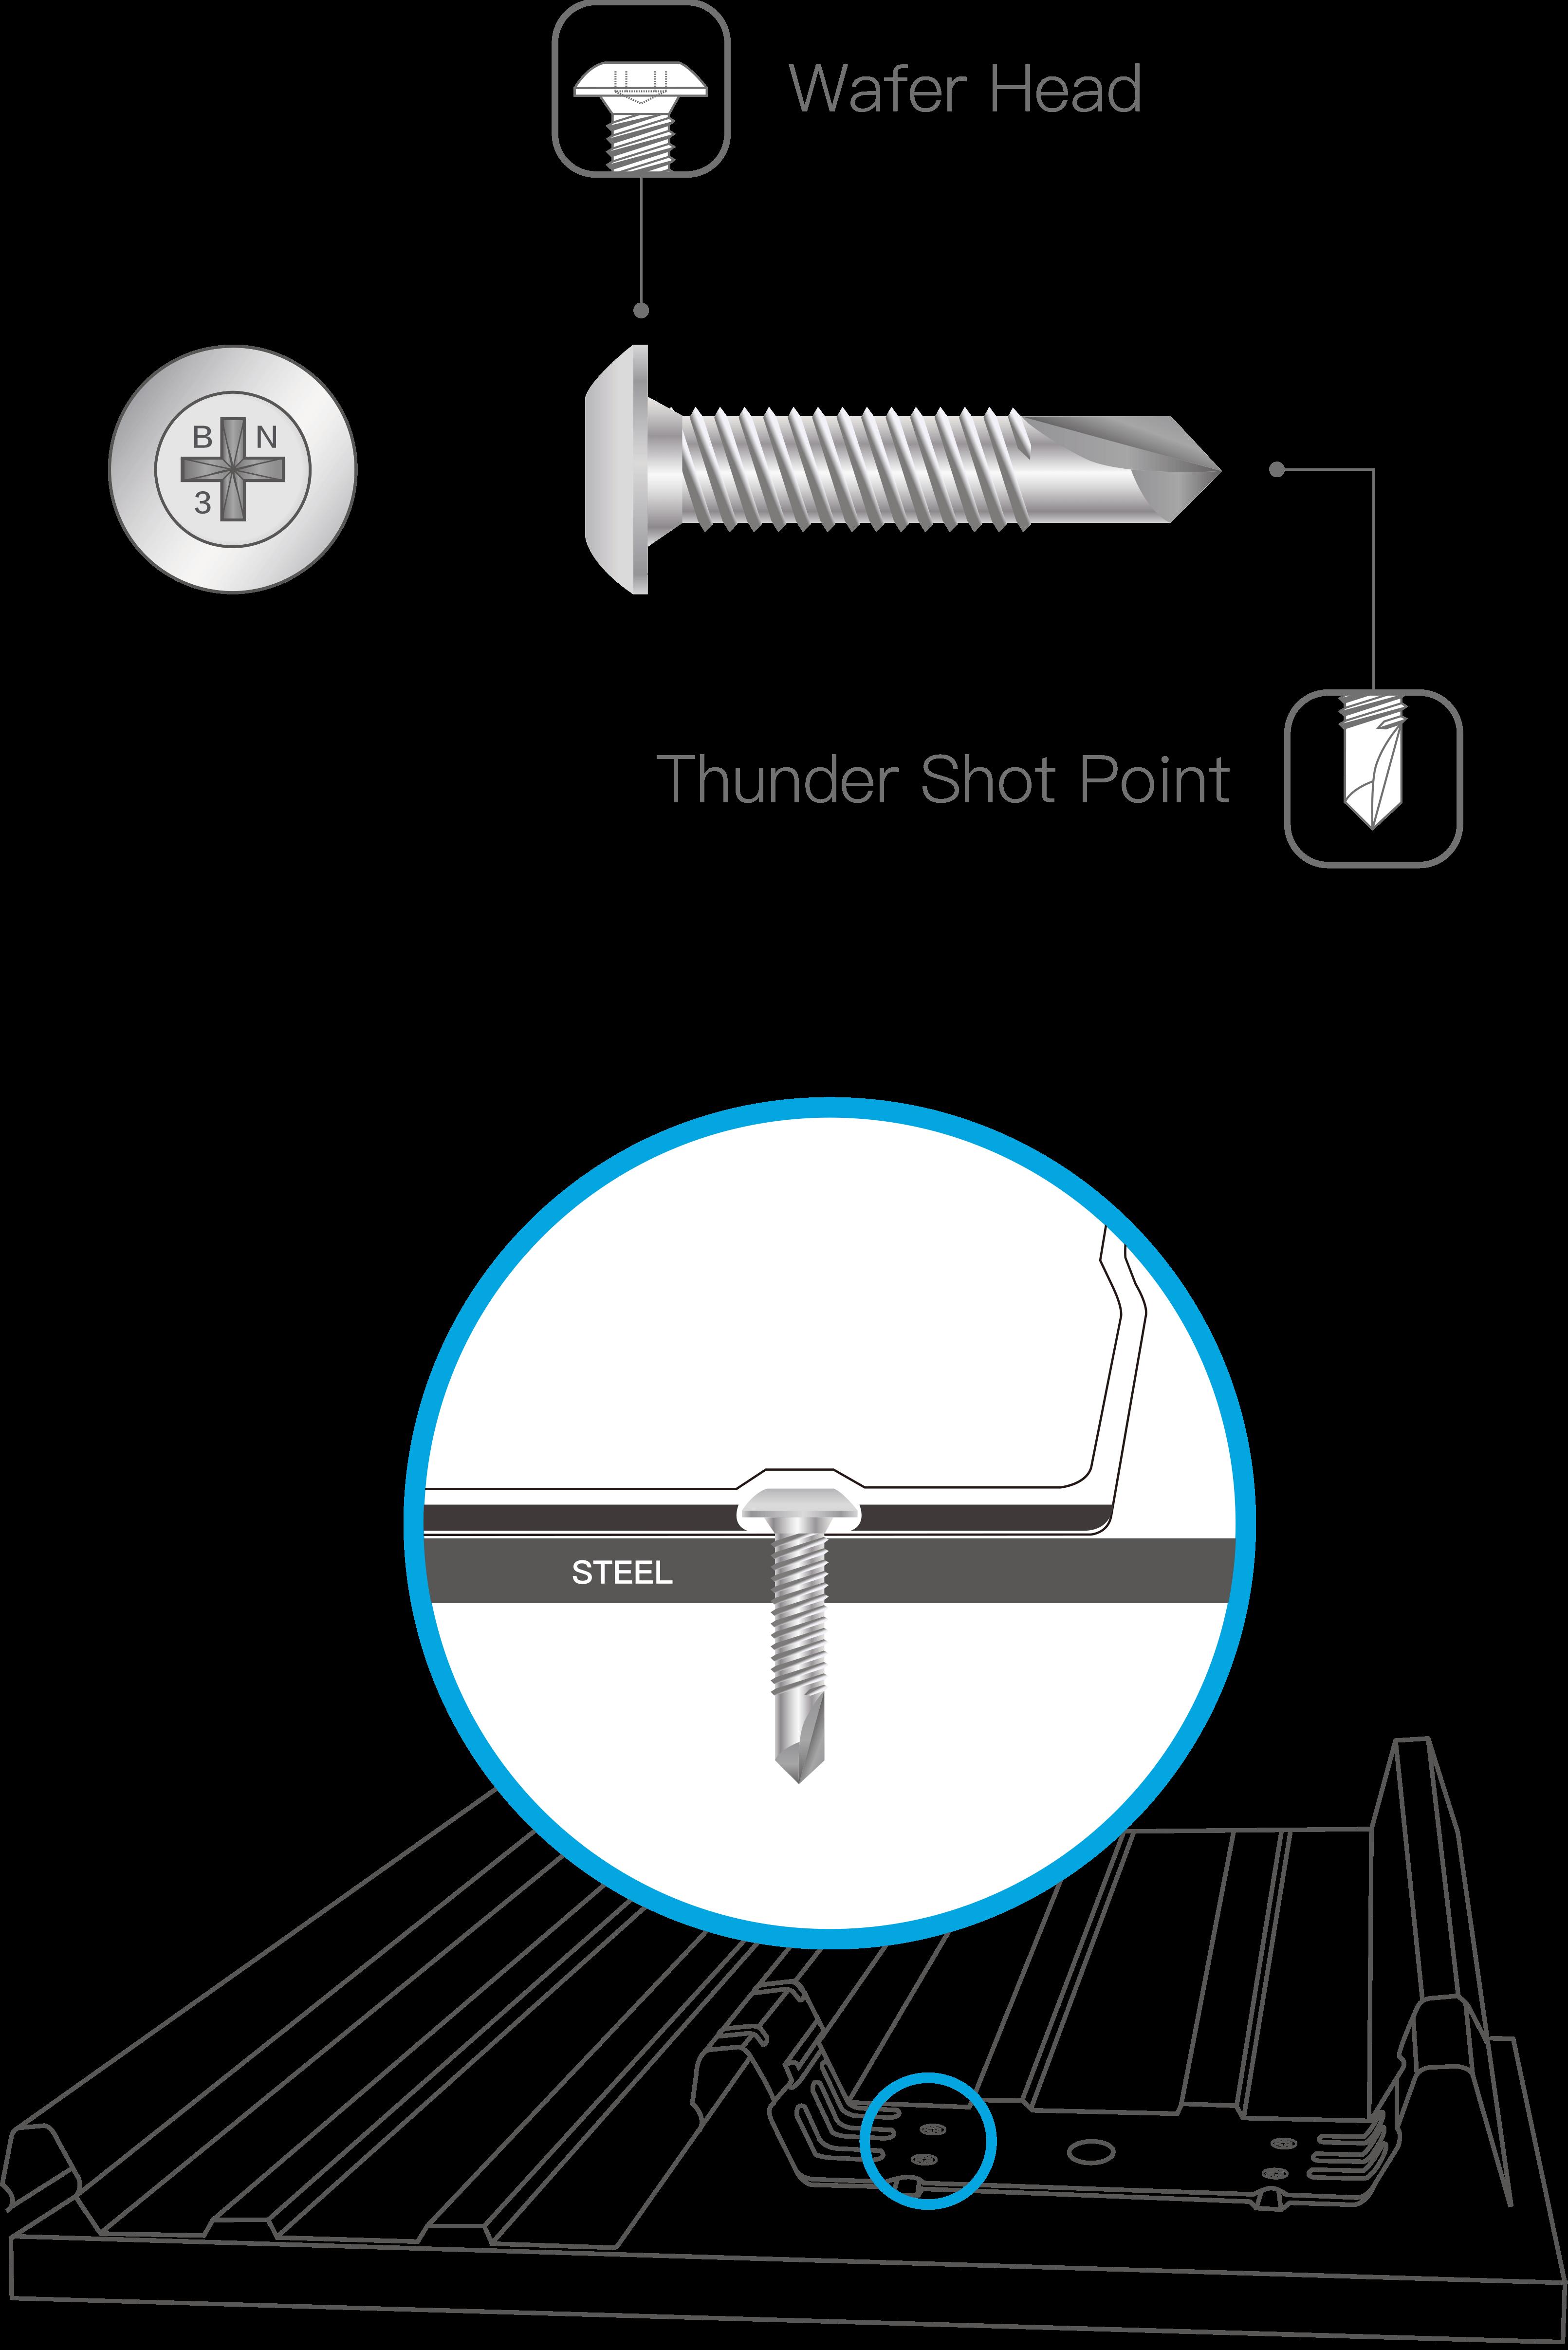 water head parts